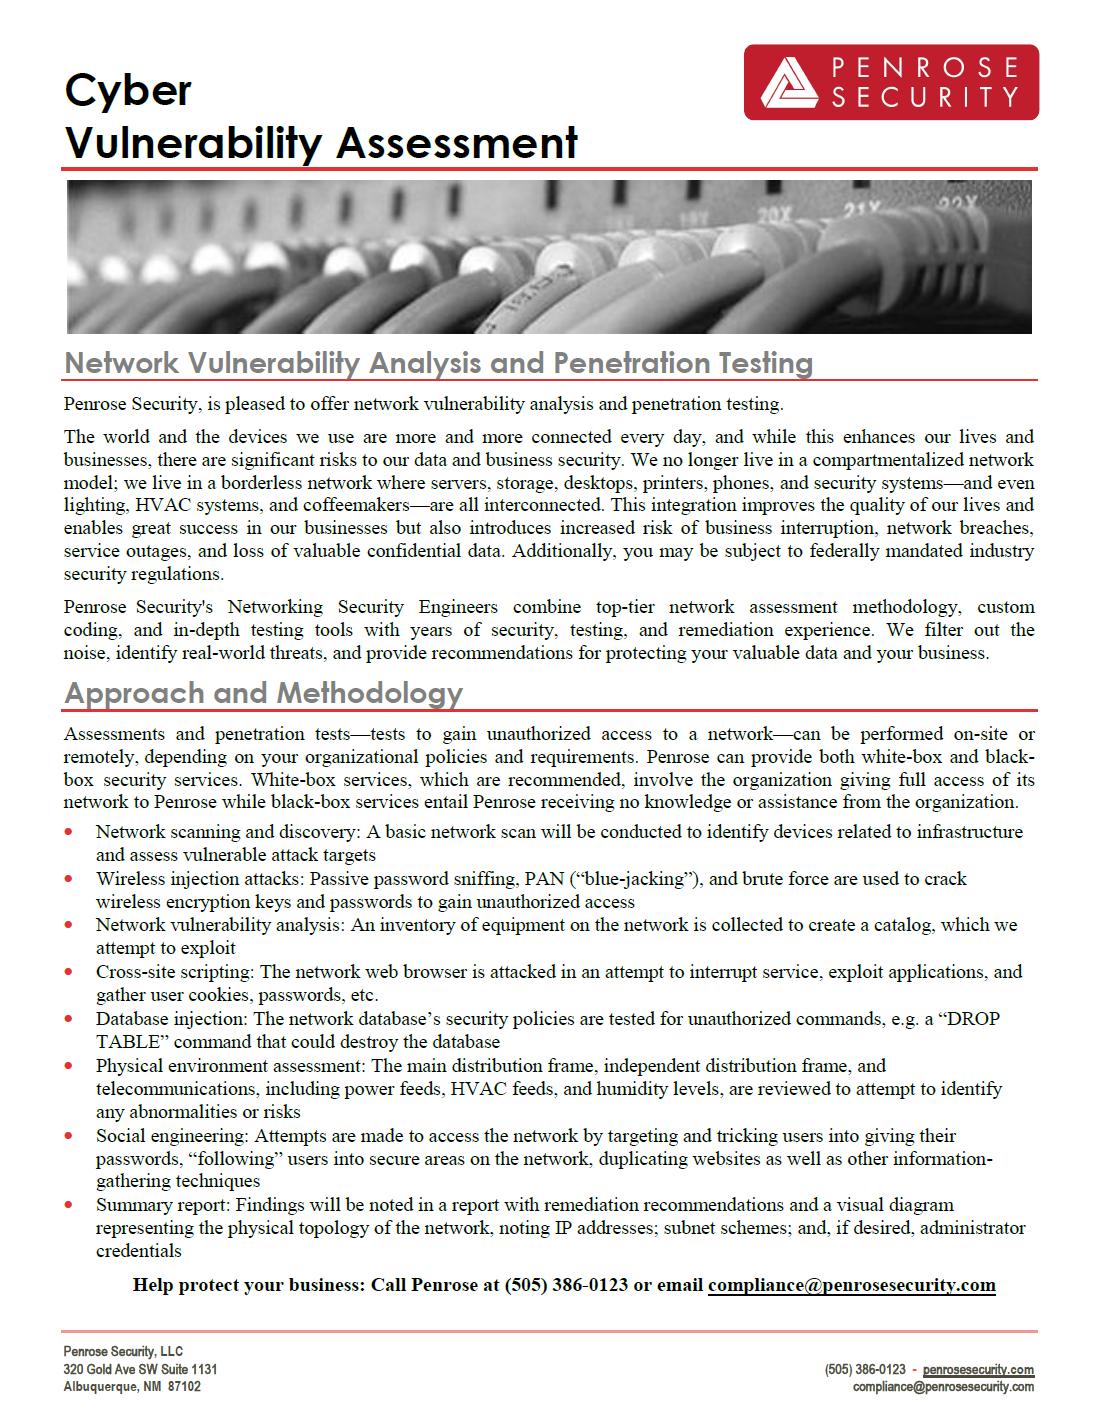 Cyber Vulnerability Assessment